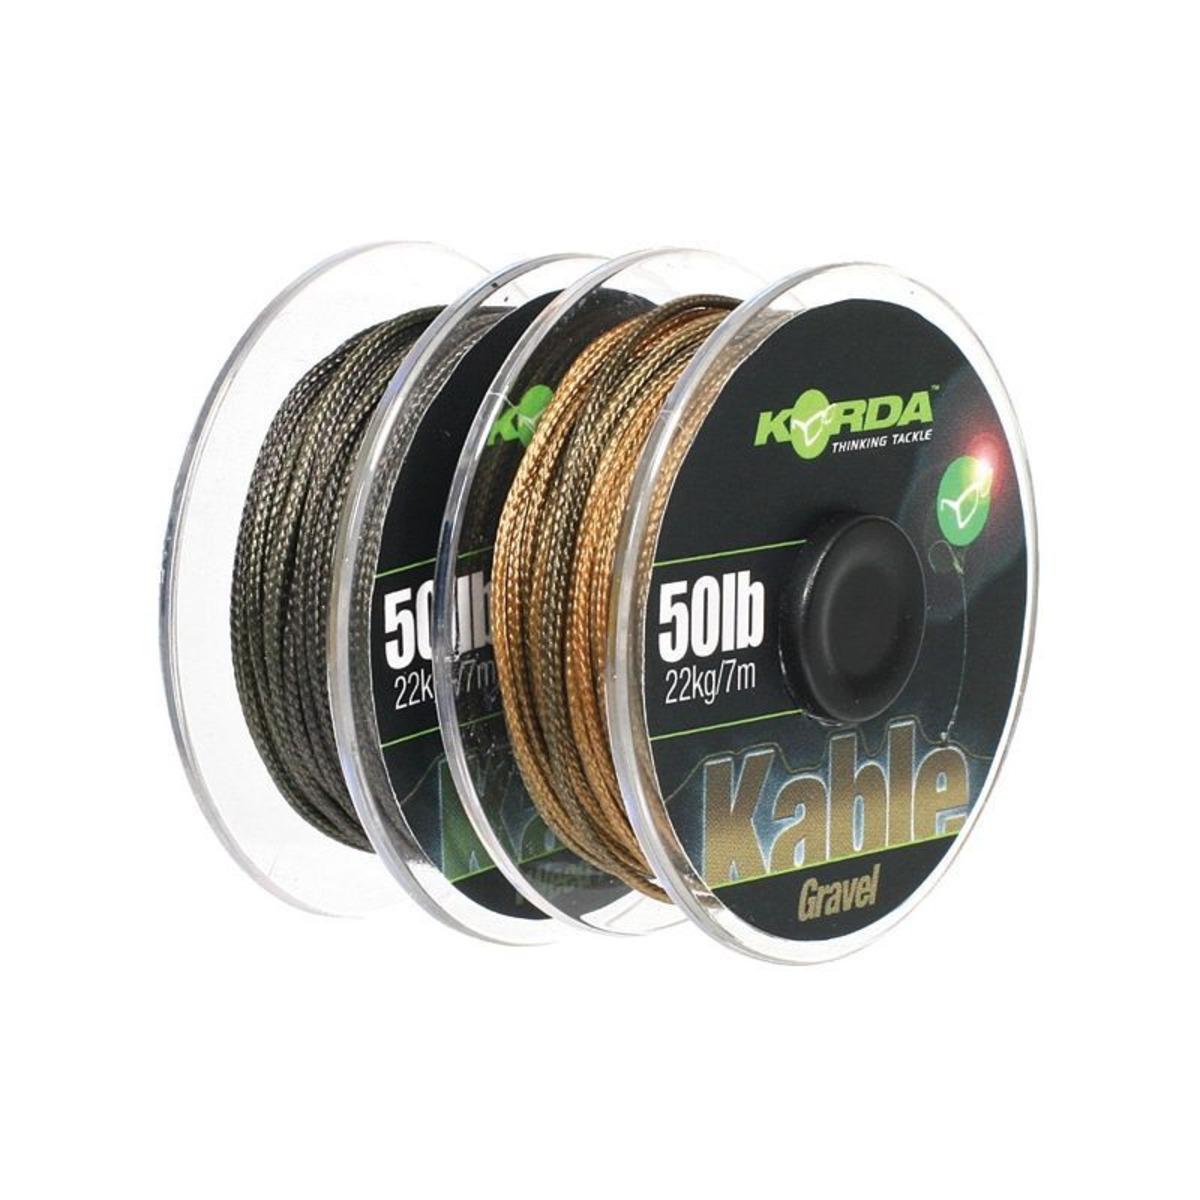 Korda Kable Leadcore - Weed - Silt - 7 m